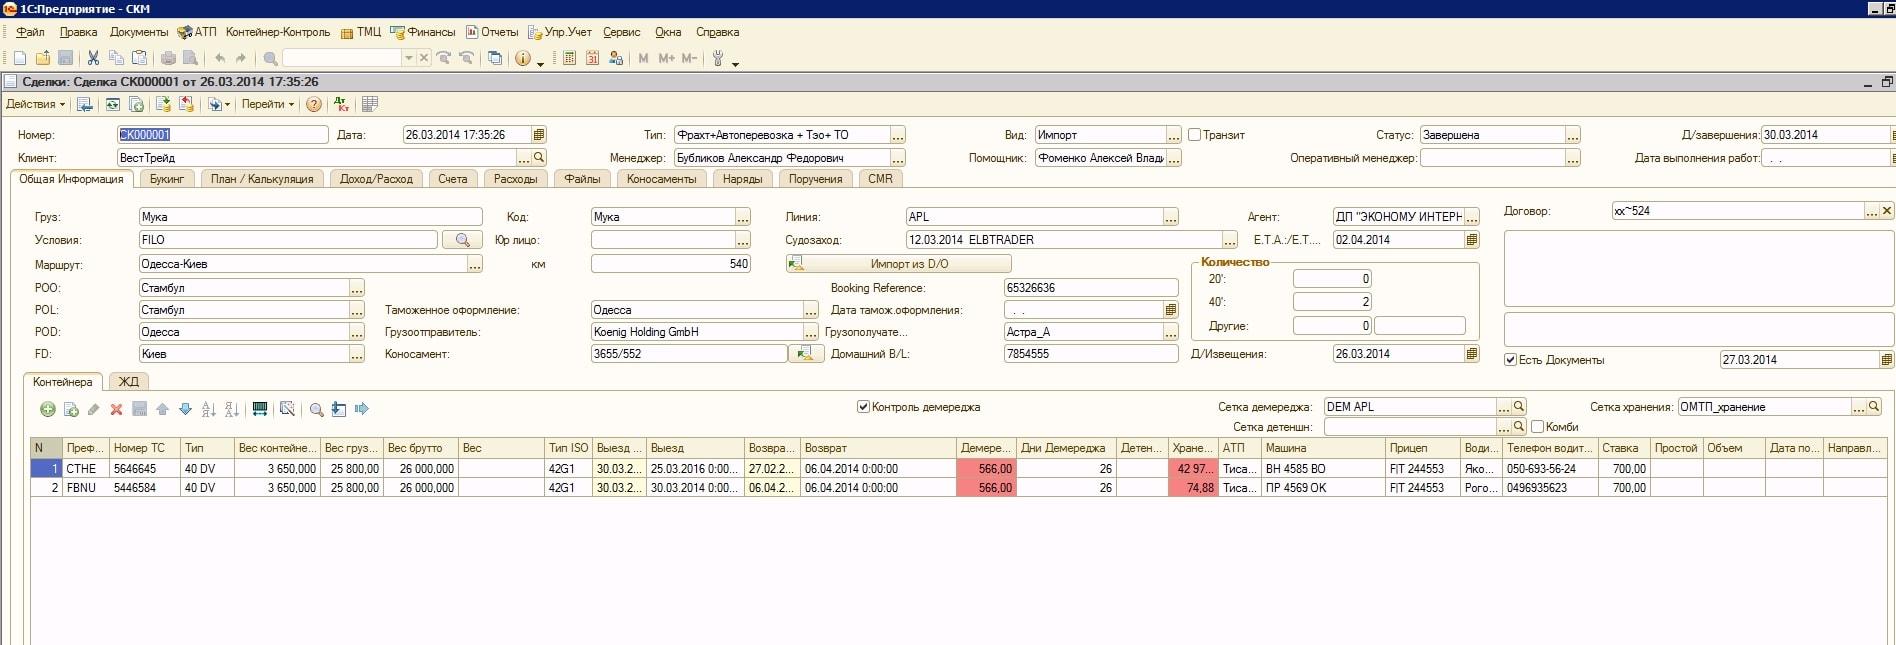 Soft-Pro ERP Forwarding